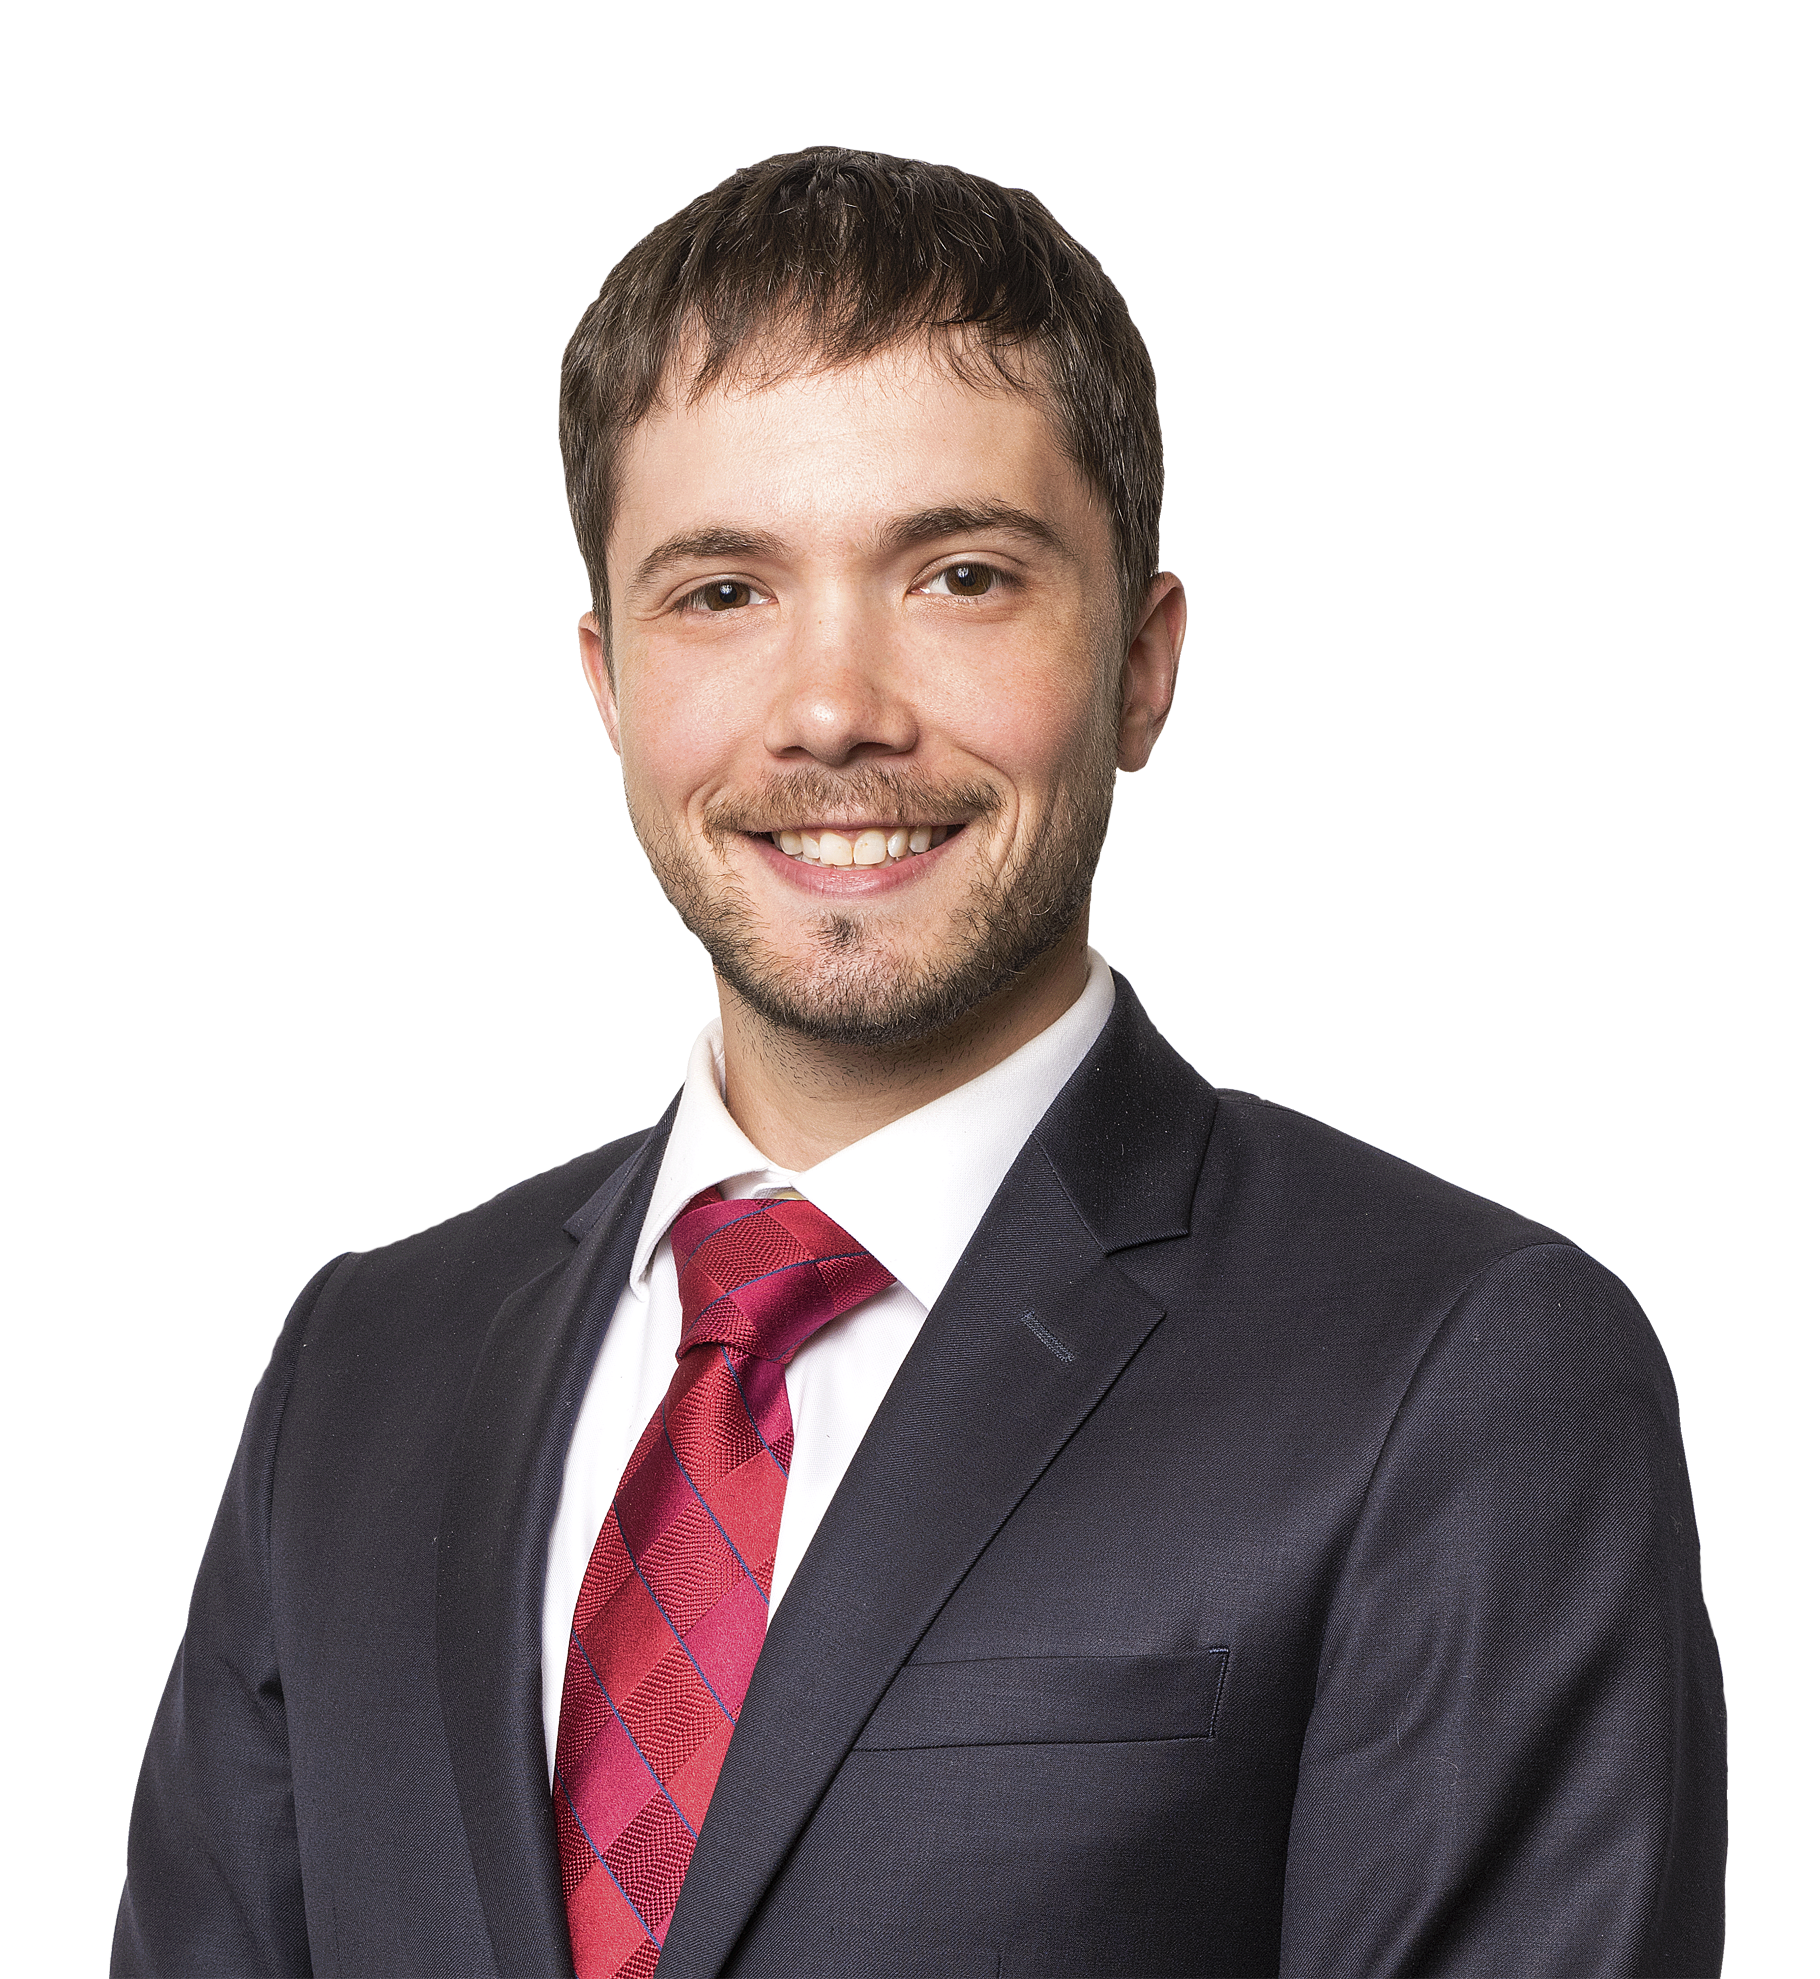 lake charles attorney Brian Bradford